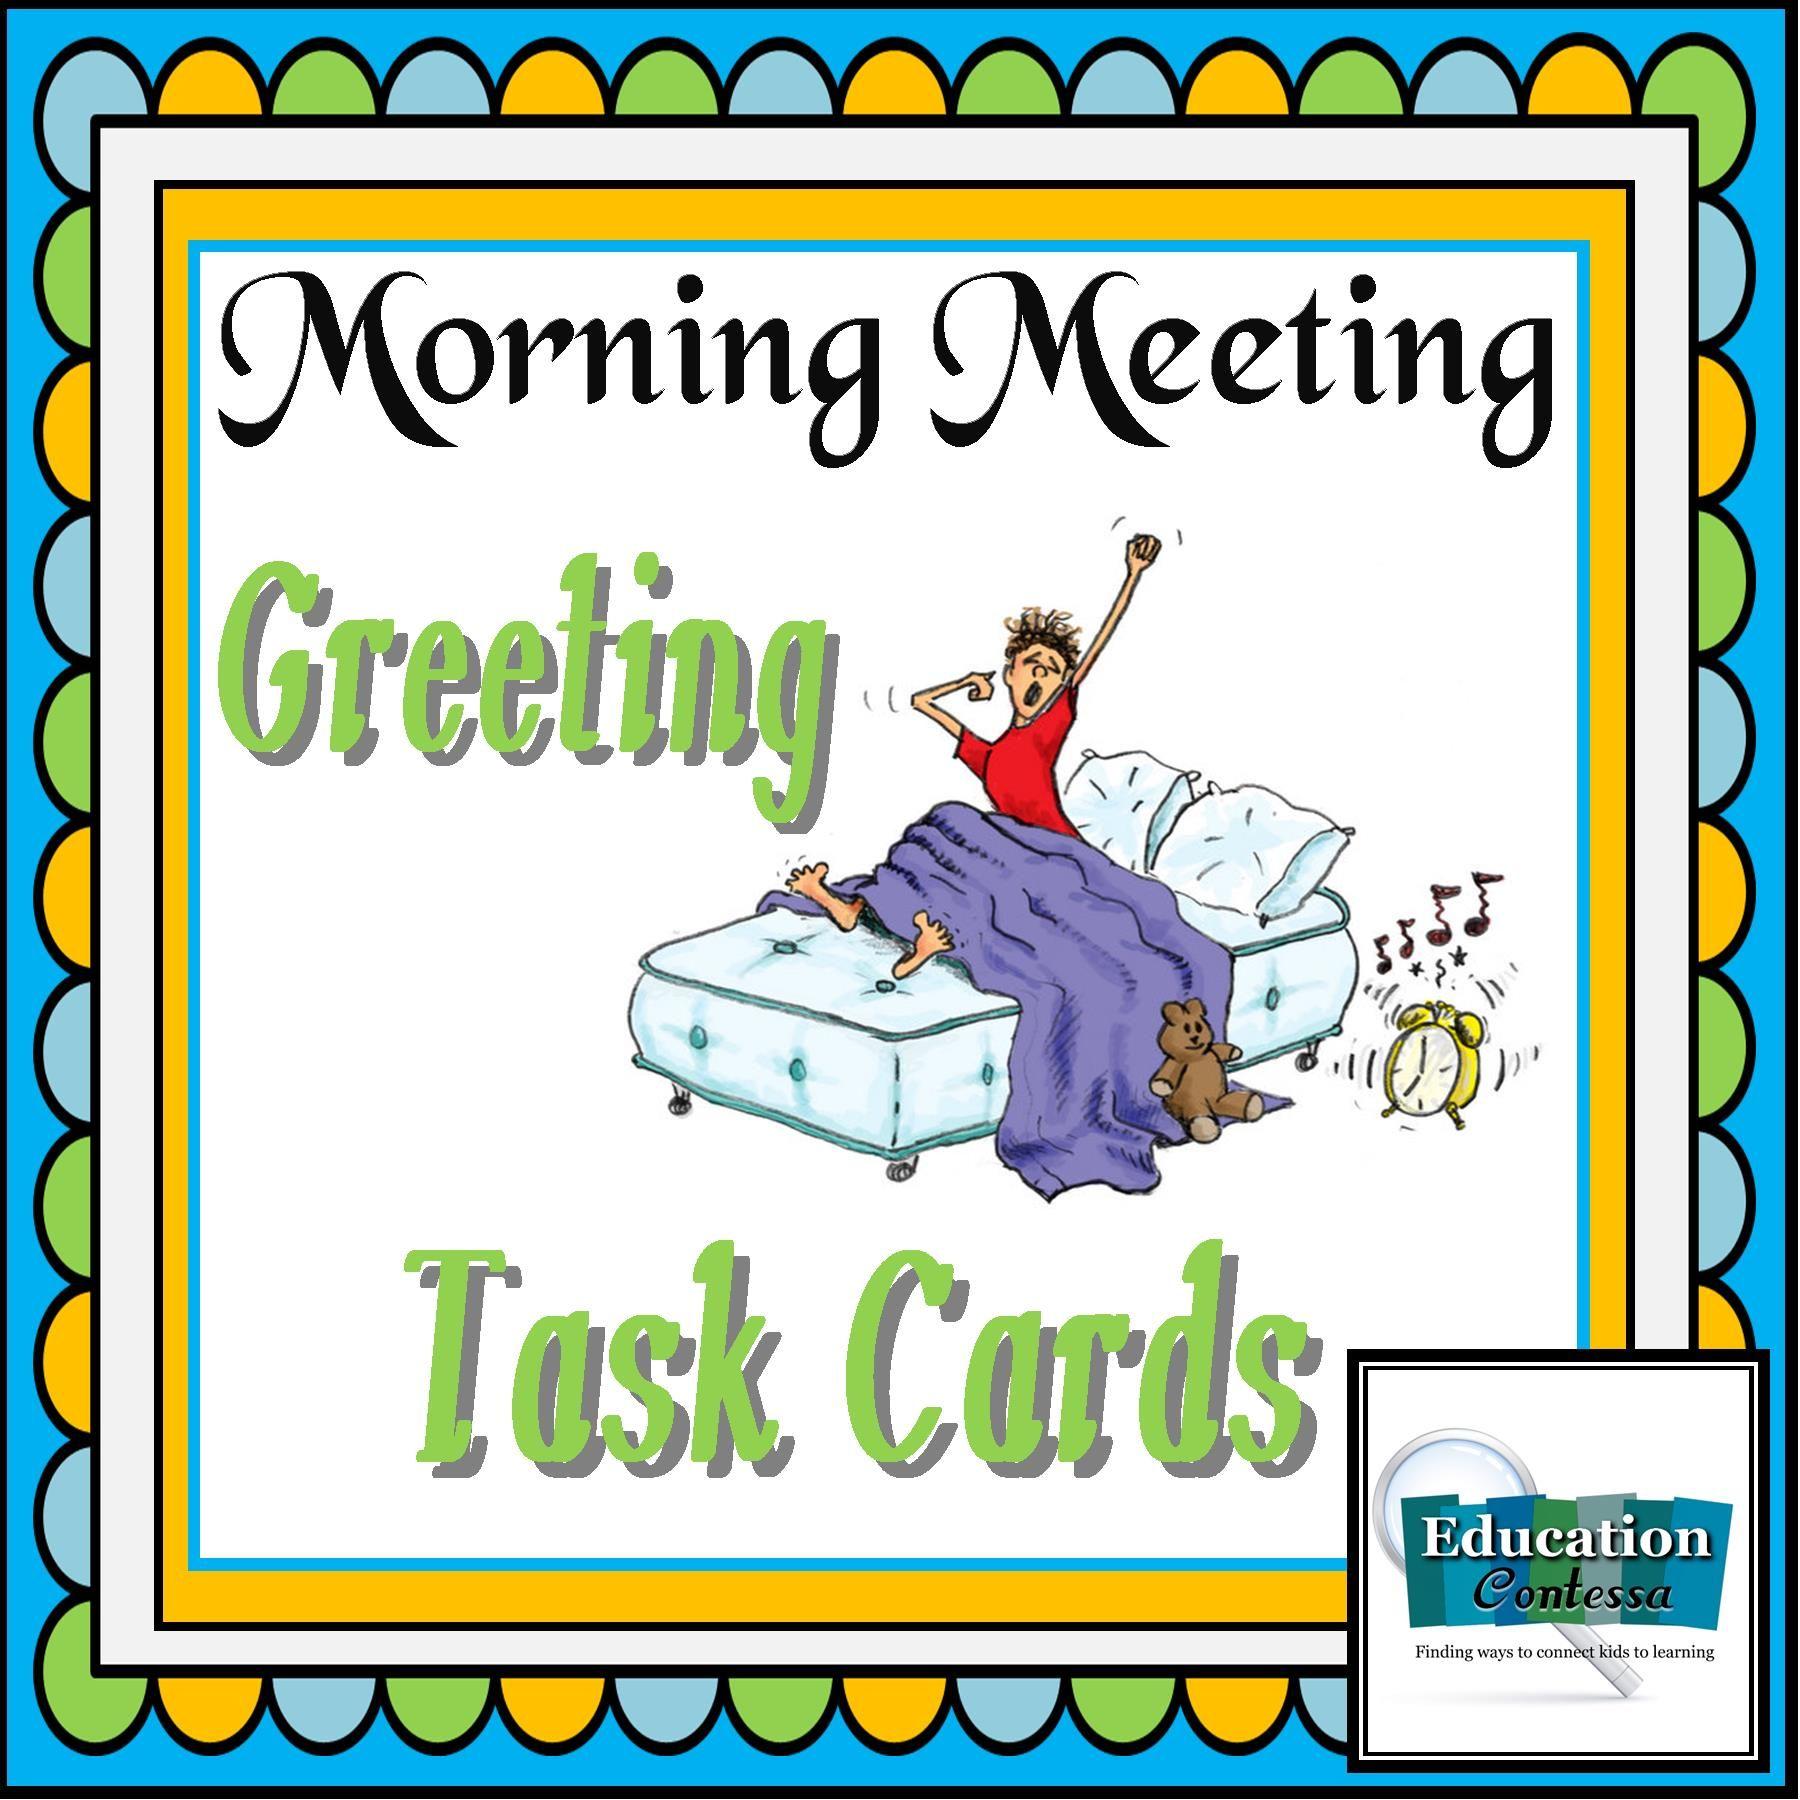 Morning Meeting Greeting Task Cards Debbie Diller Inspired Ideas